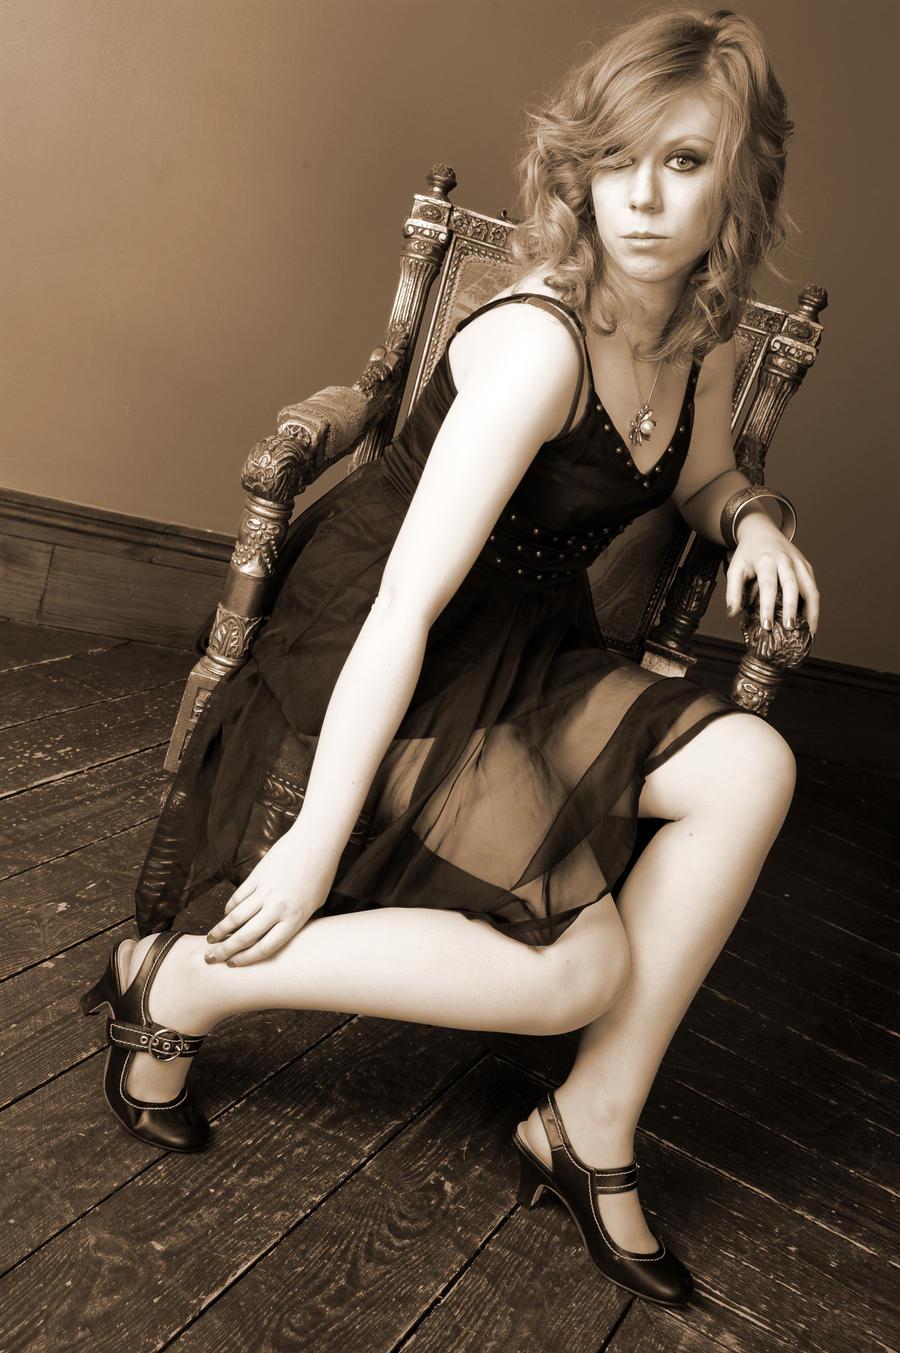 Izrazite svoja osecanja slikom My_royal_throne_by_mentyra-d4ebh4j